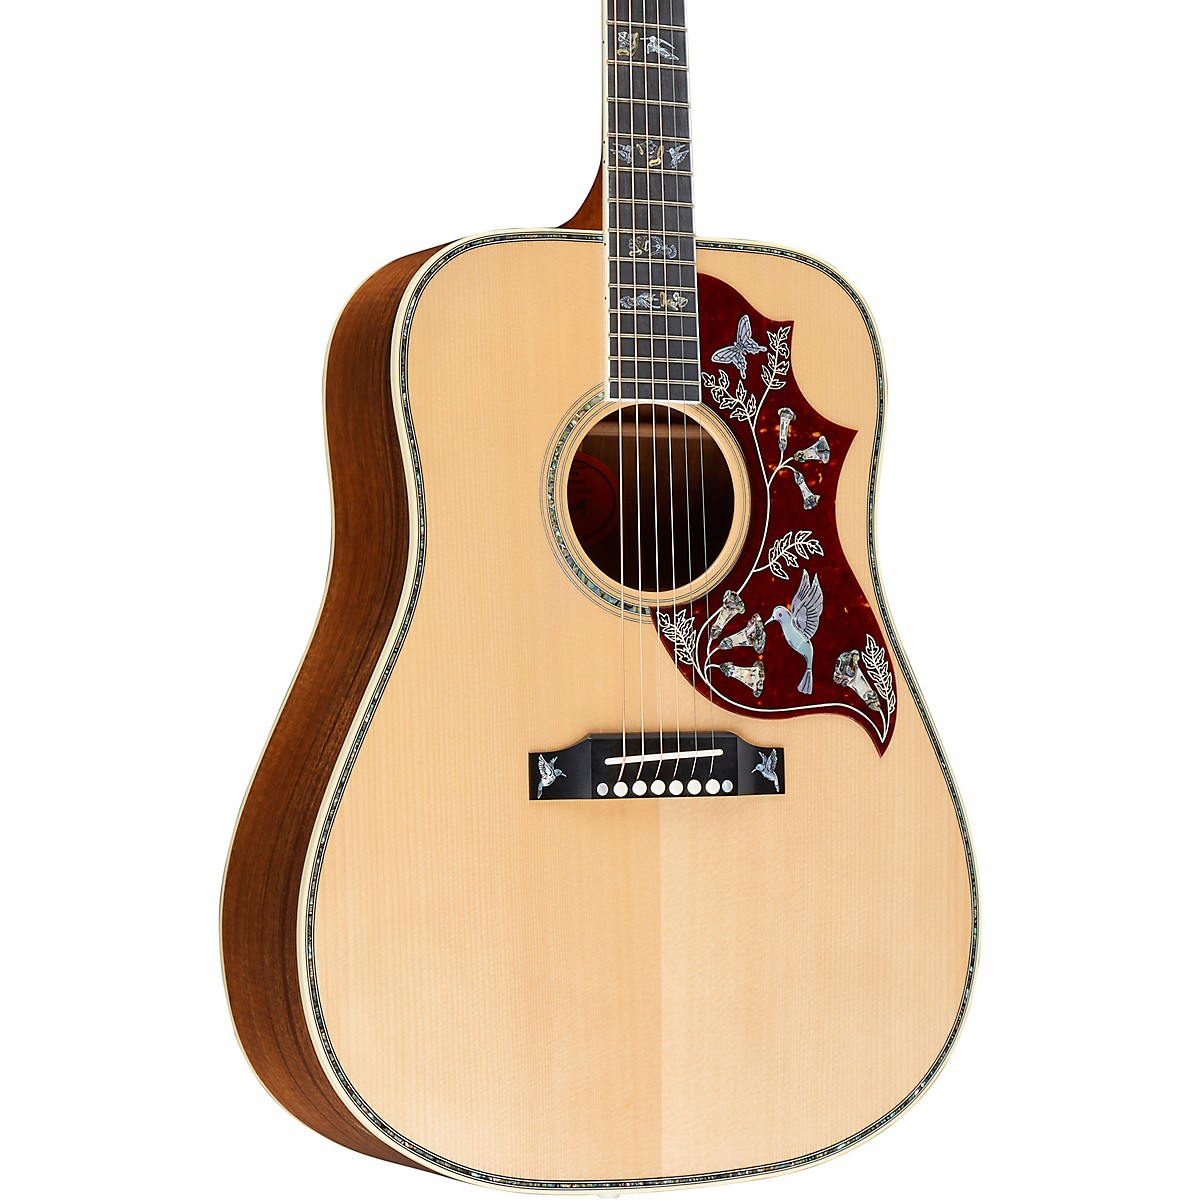 Gibson Hummingbird Custom Limited Acoustic-Electric Guitar